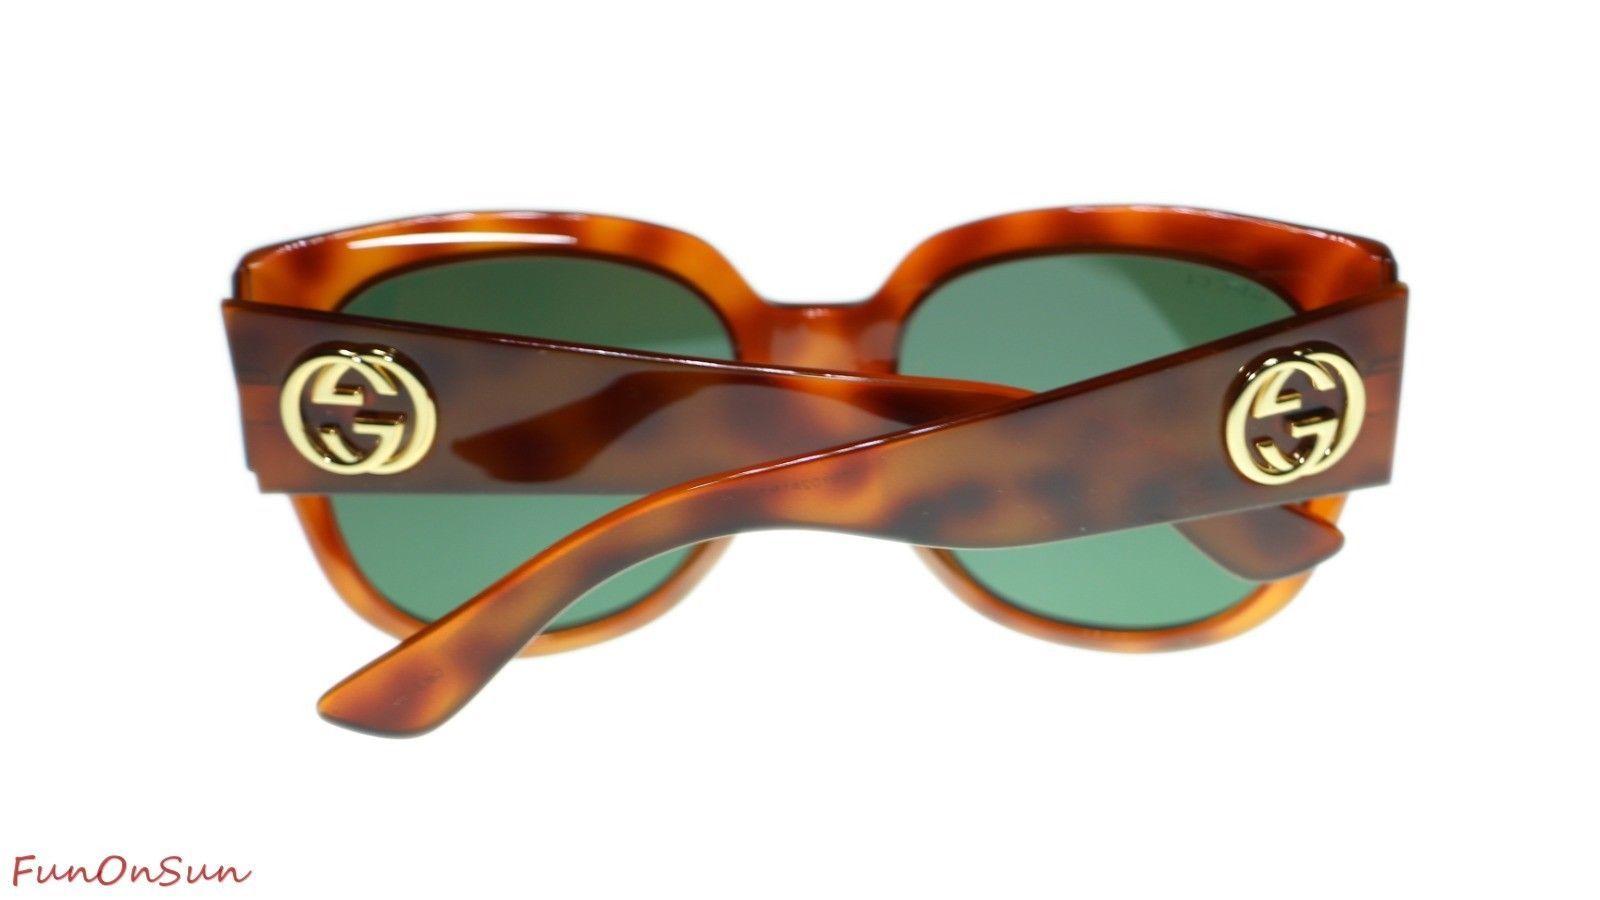 a4e888efed Gucci Women s Sunglasses GG0142SA 002 Havana Green Lens Square 55mm